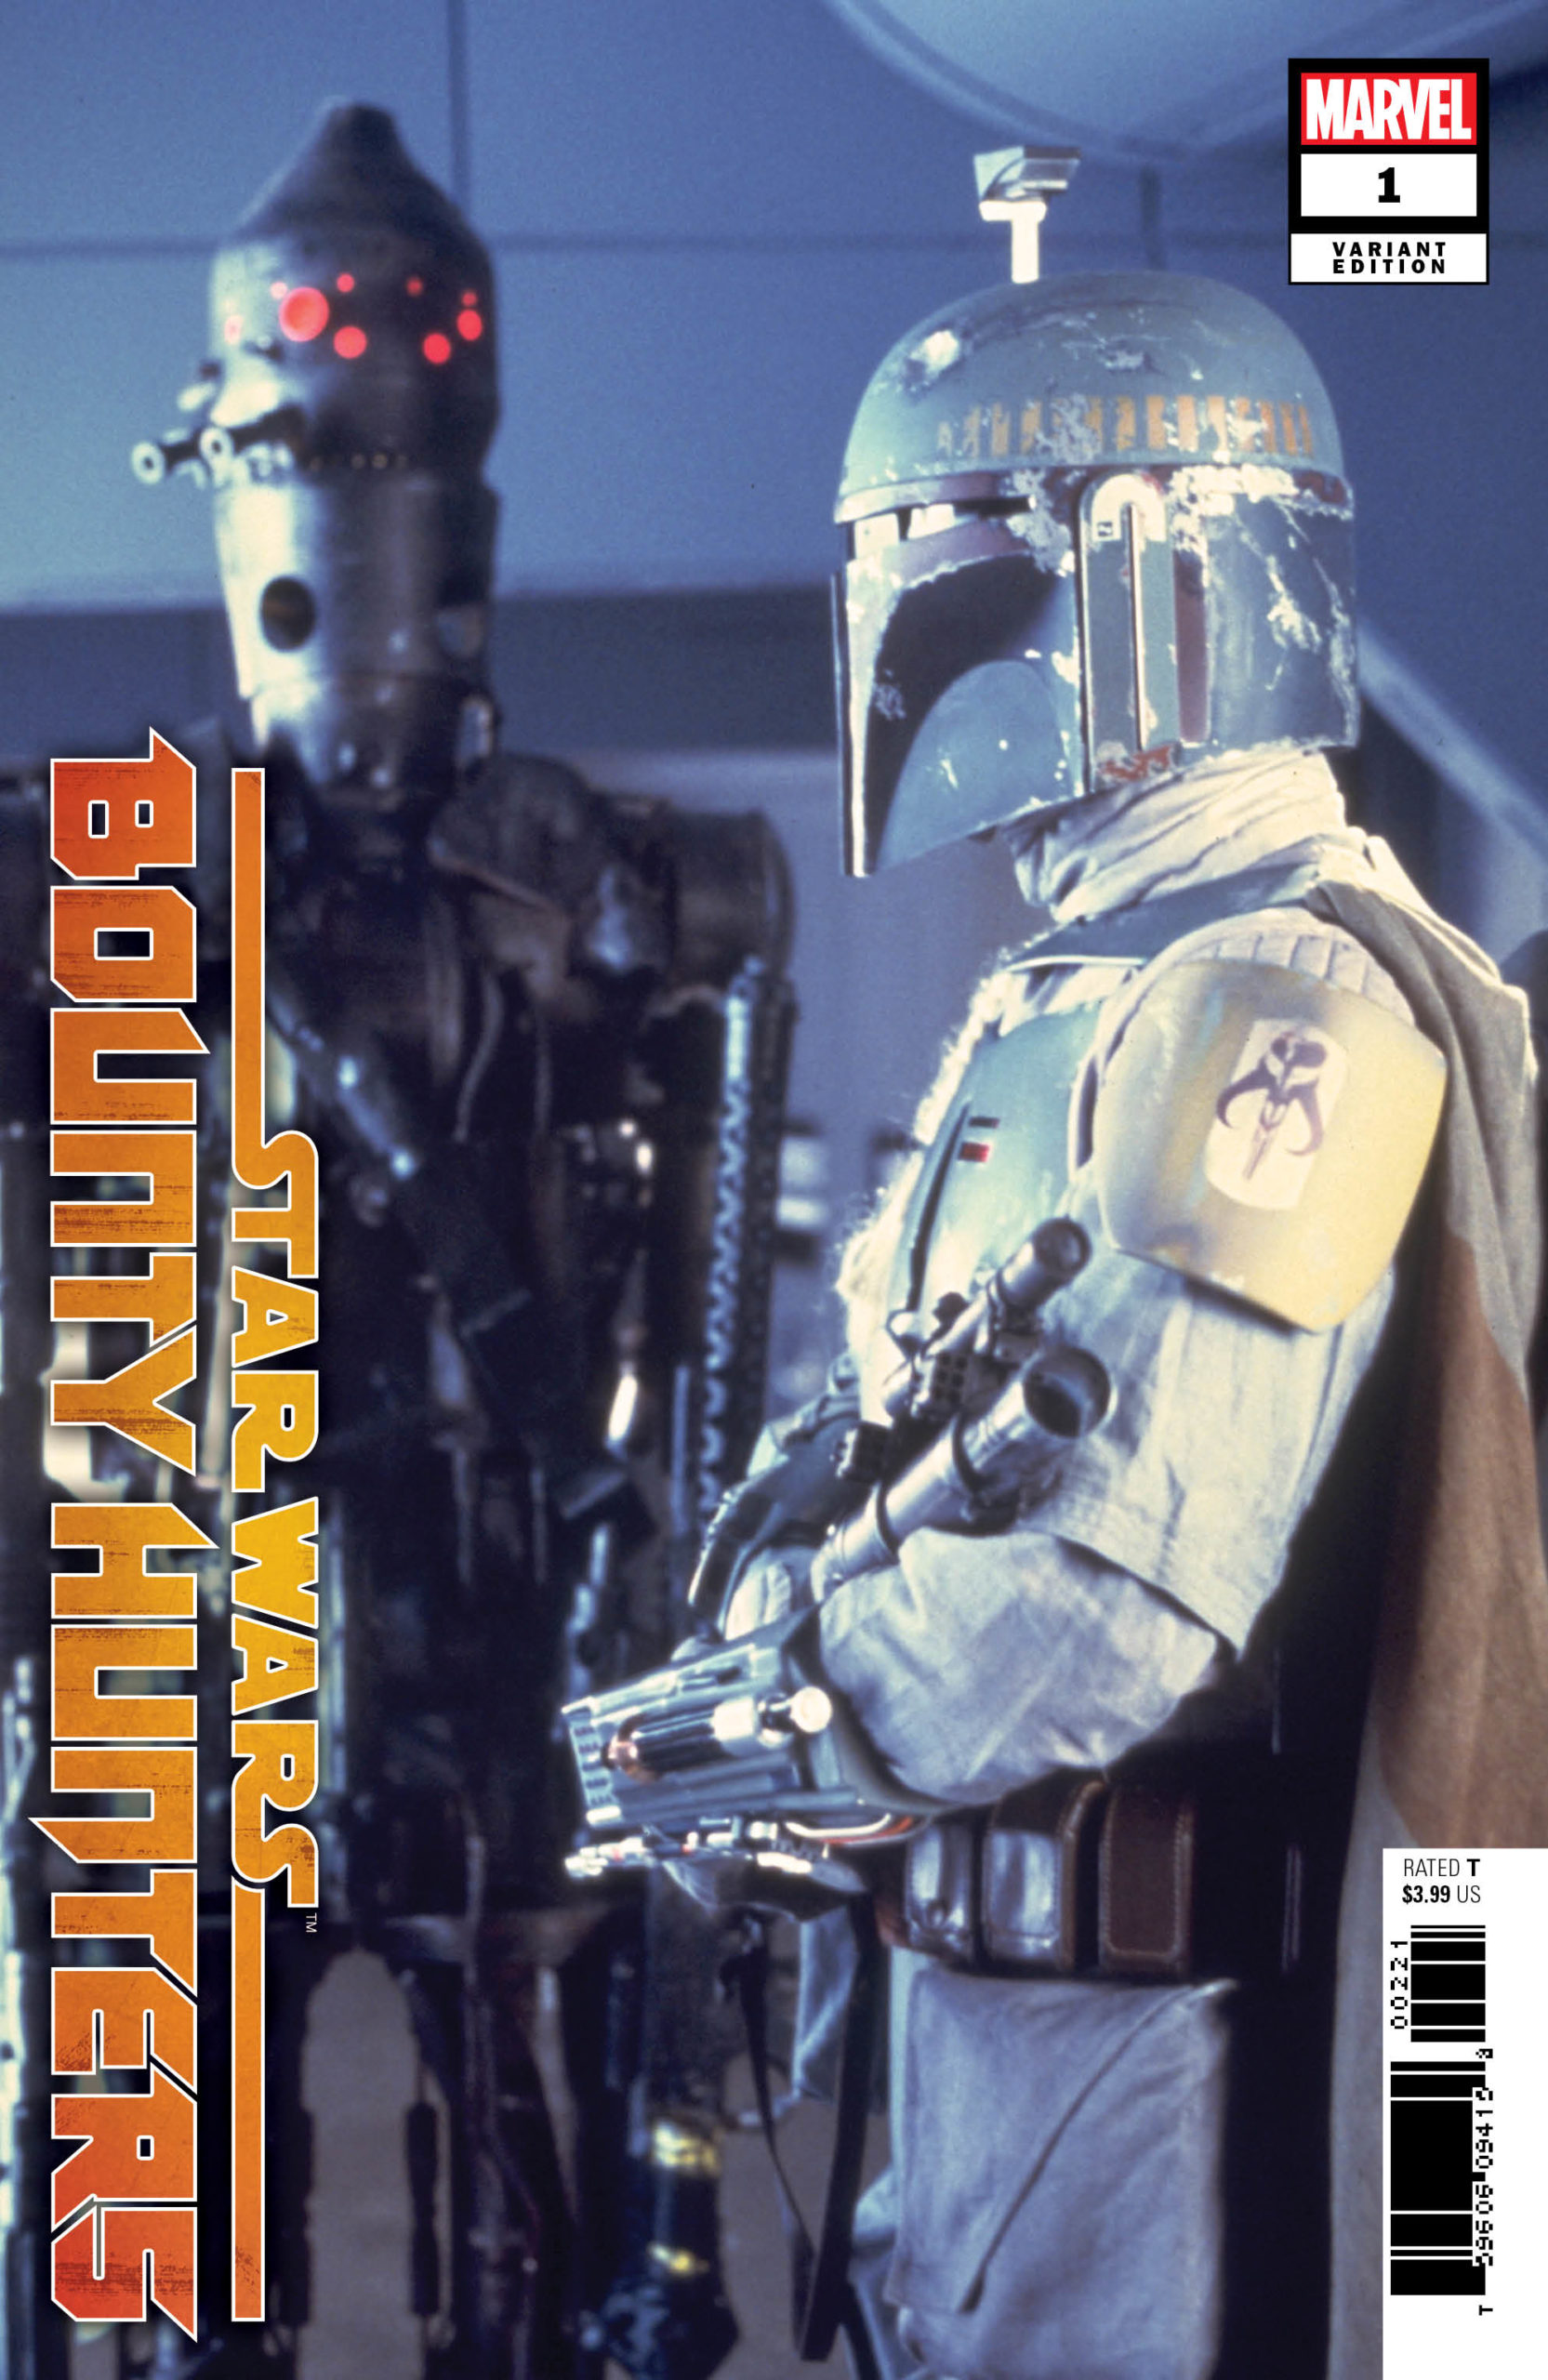 Bounty Hunters #1 (Movie Variant Cover) (11.03.2020)